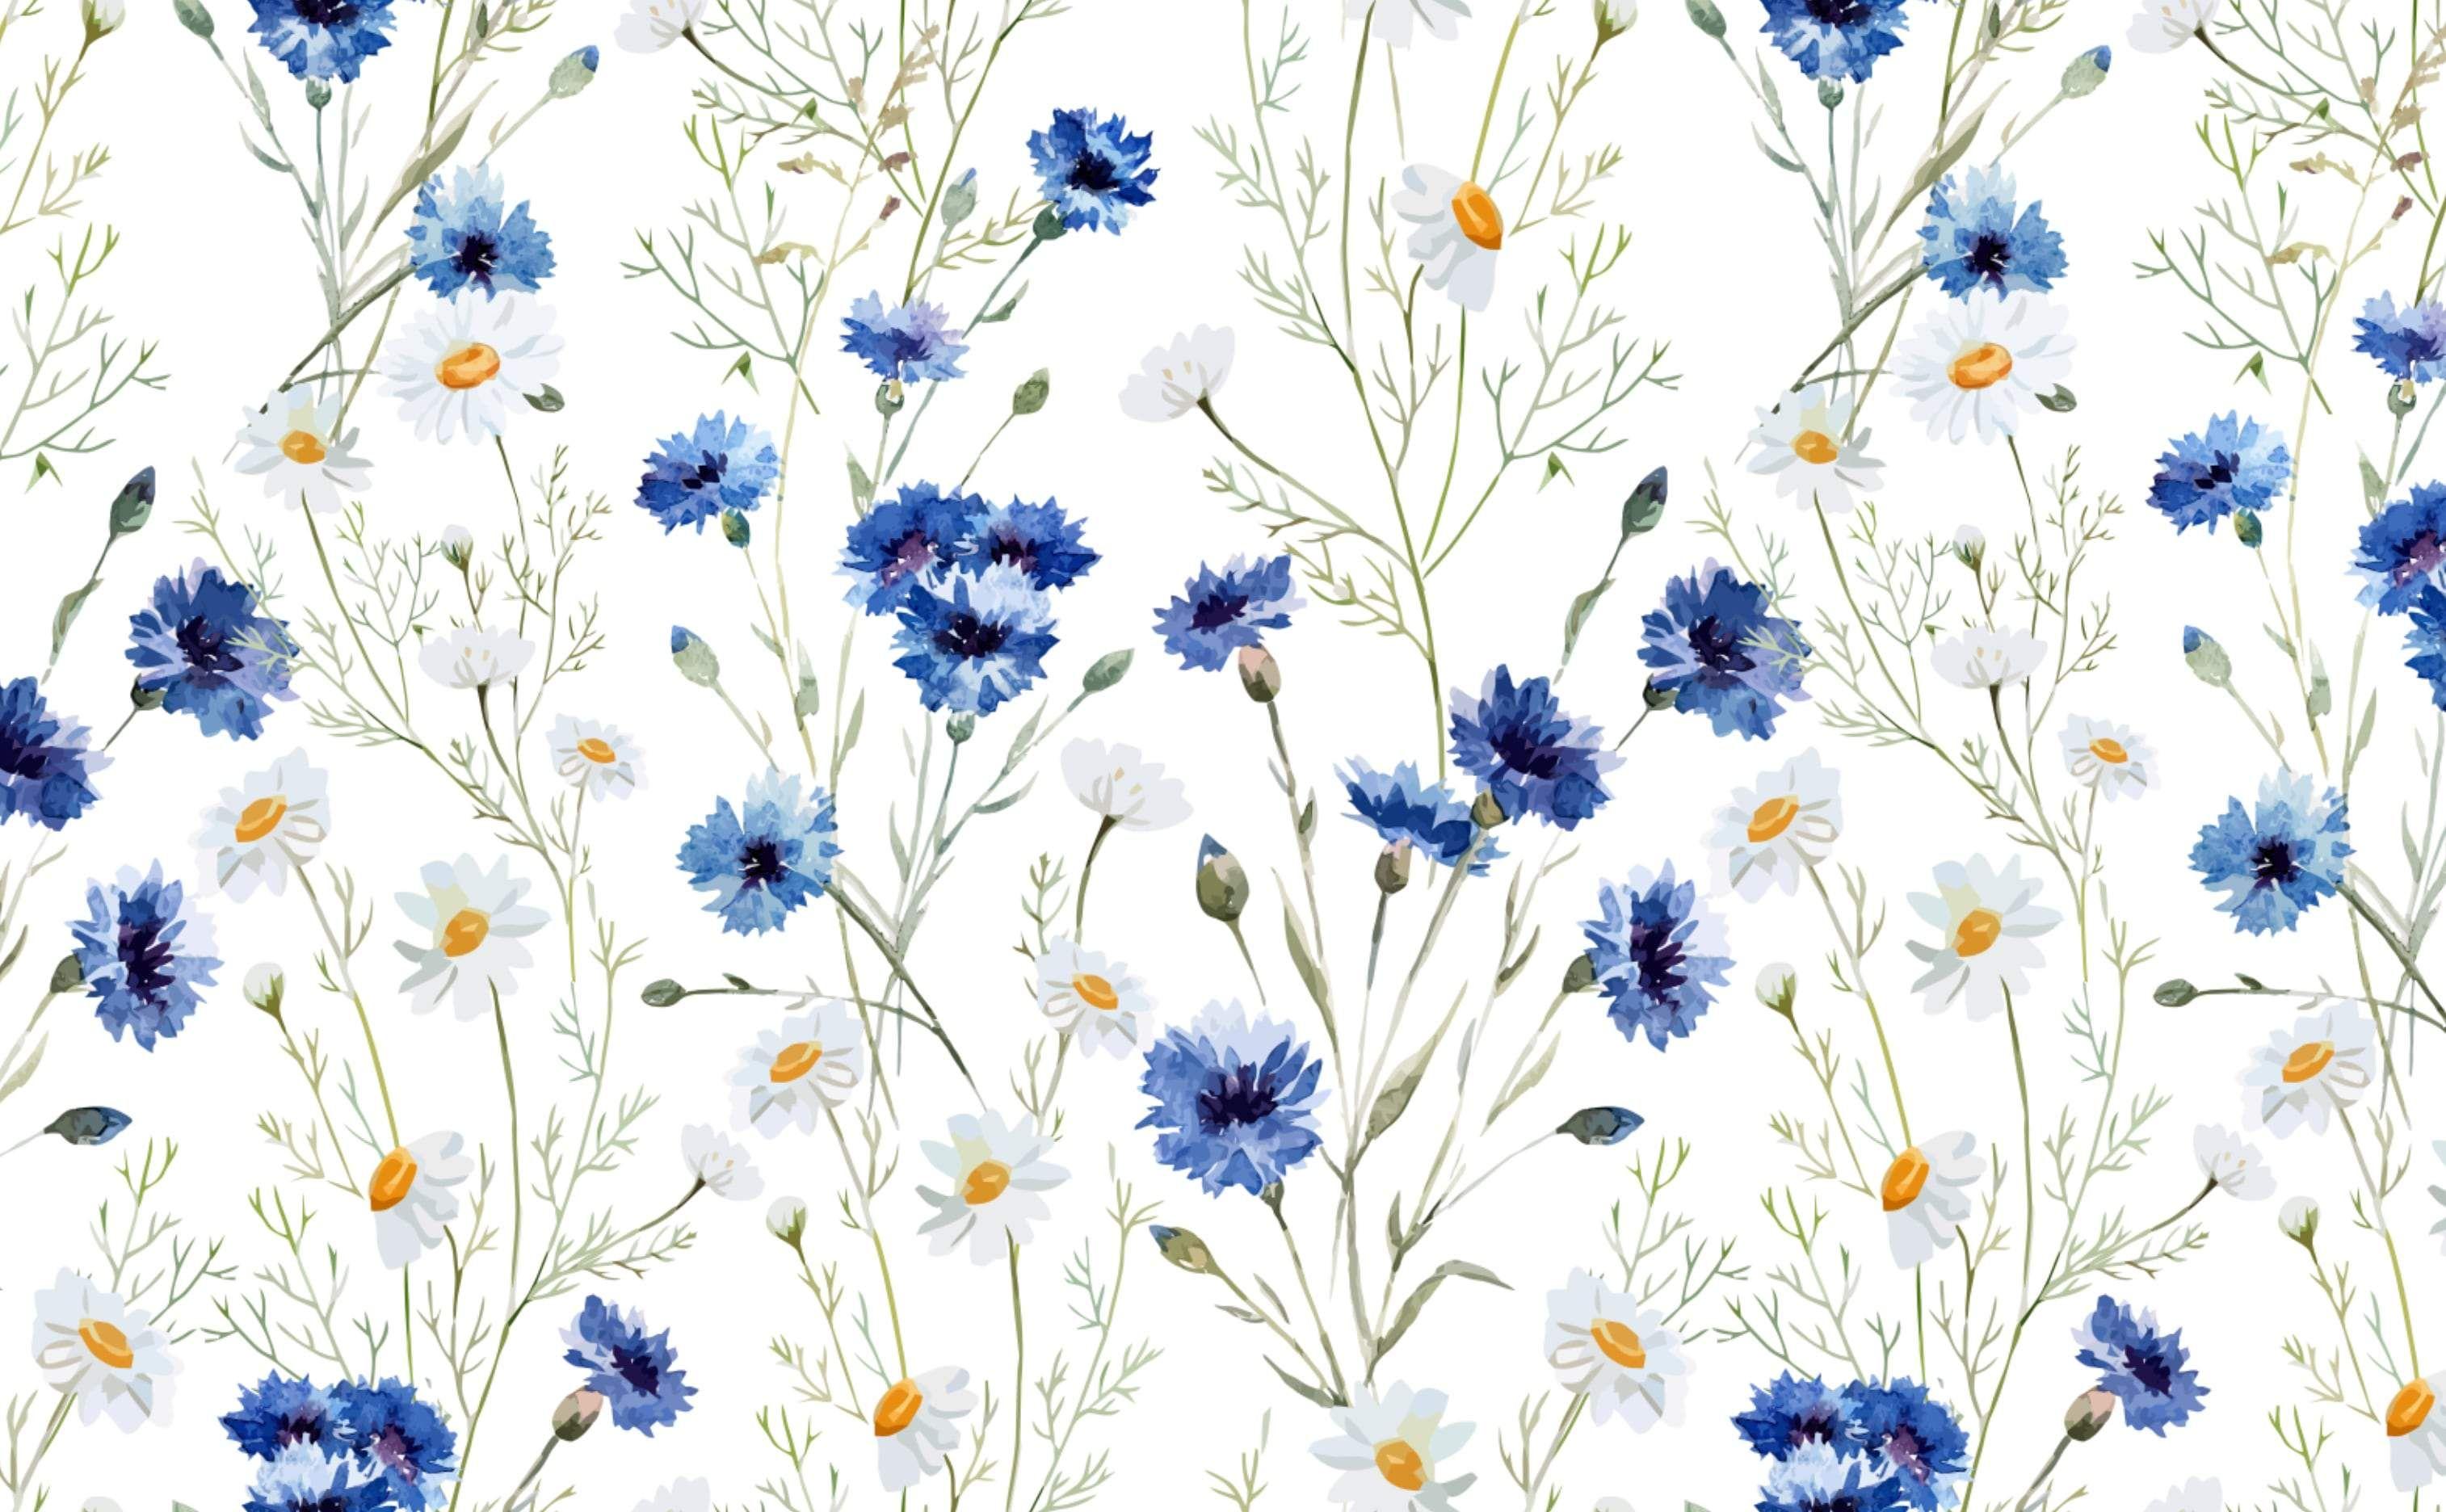 Daisy Delight Cute desktop wallpaper Cute laptop wallpaper 3028x1872